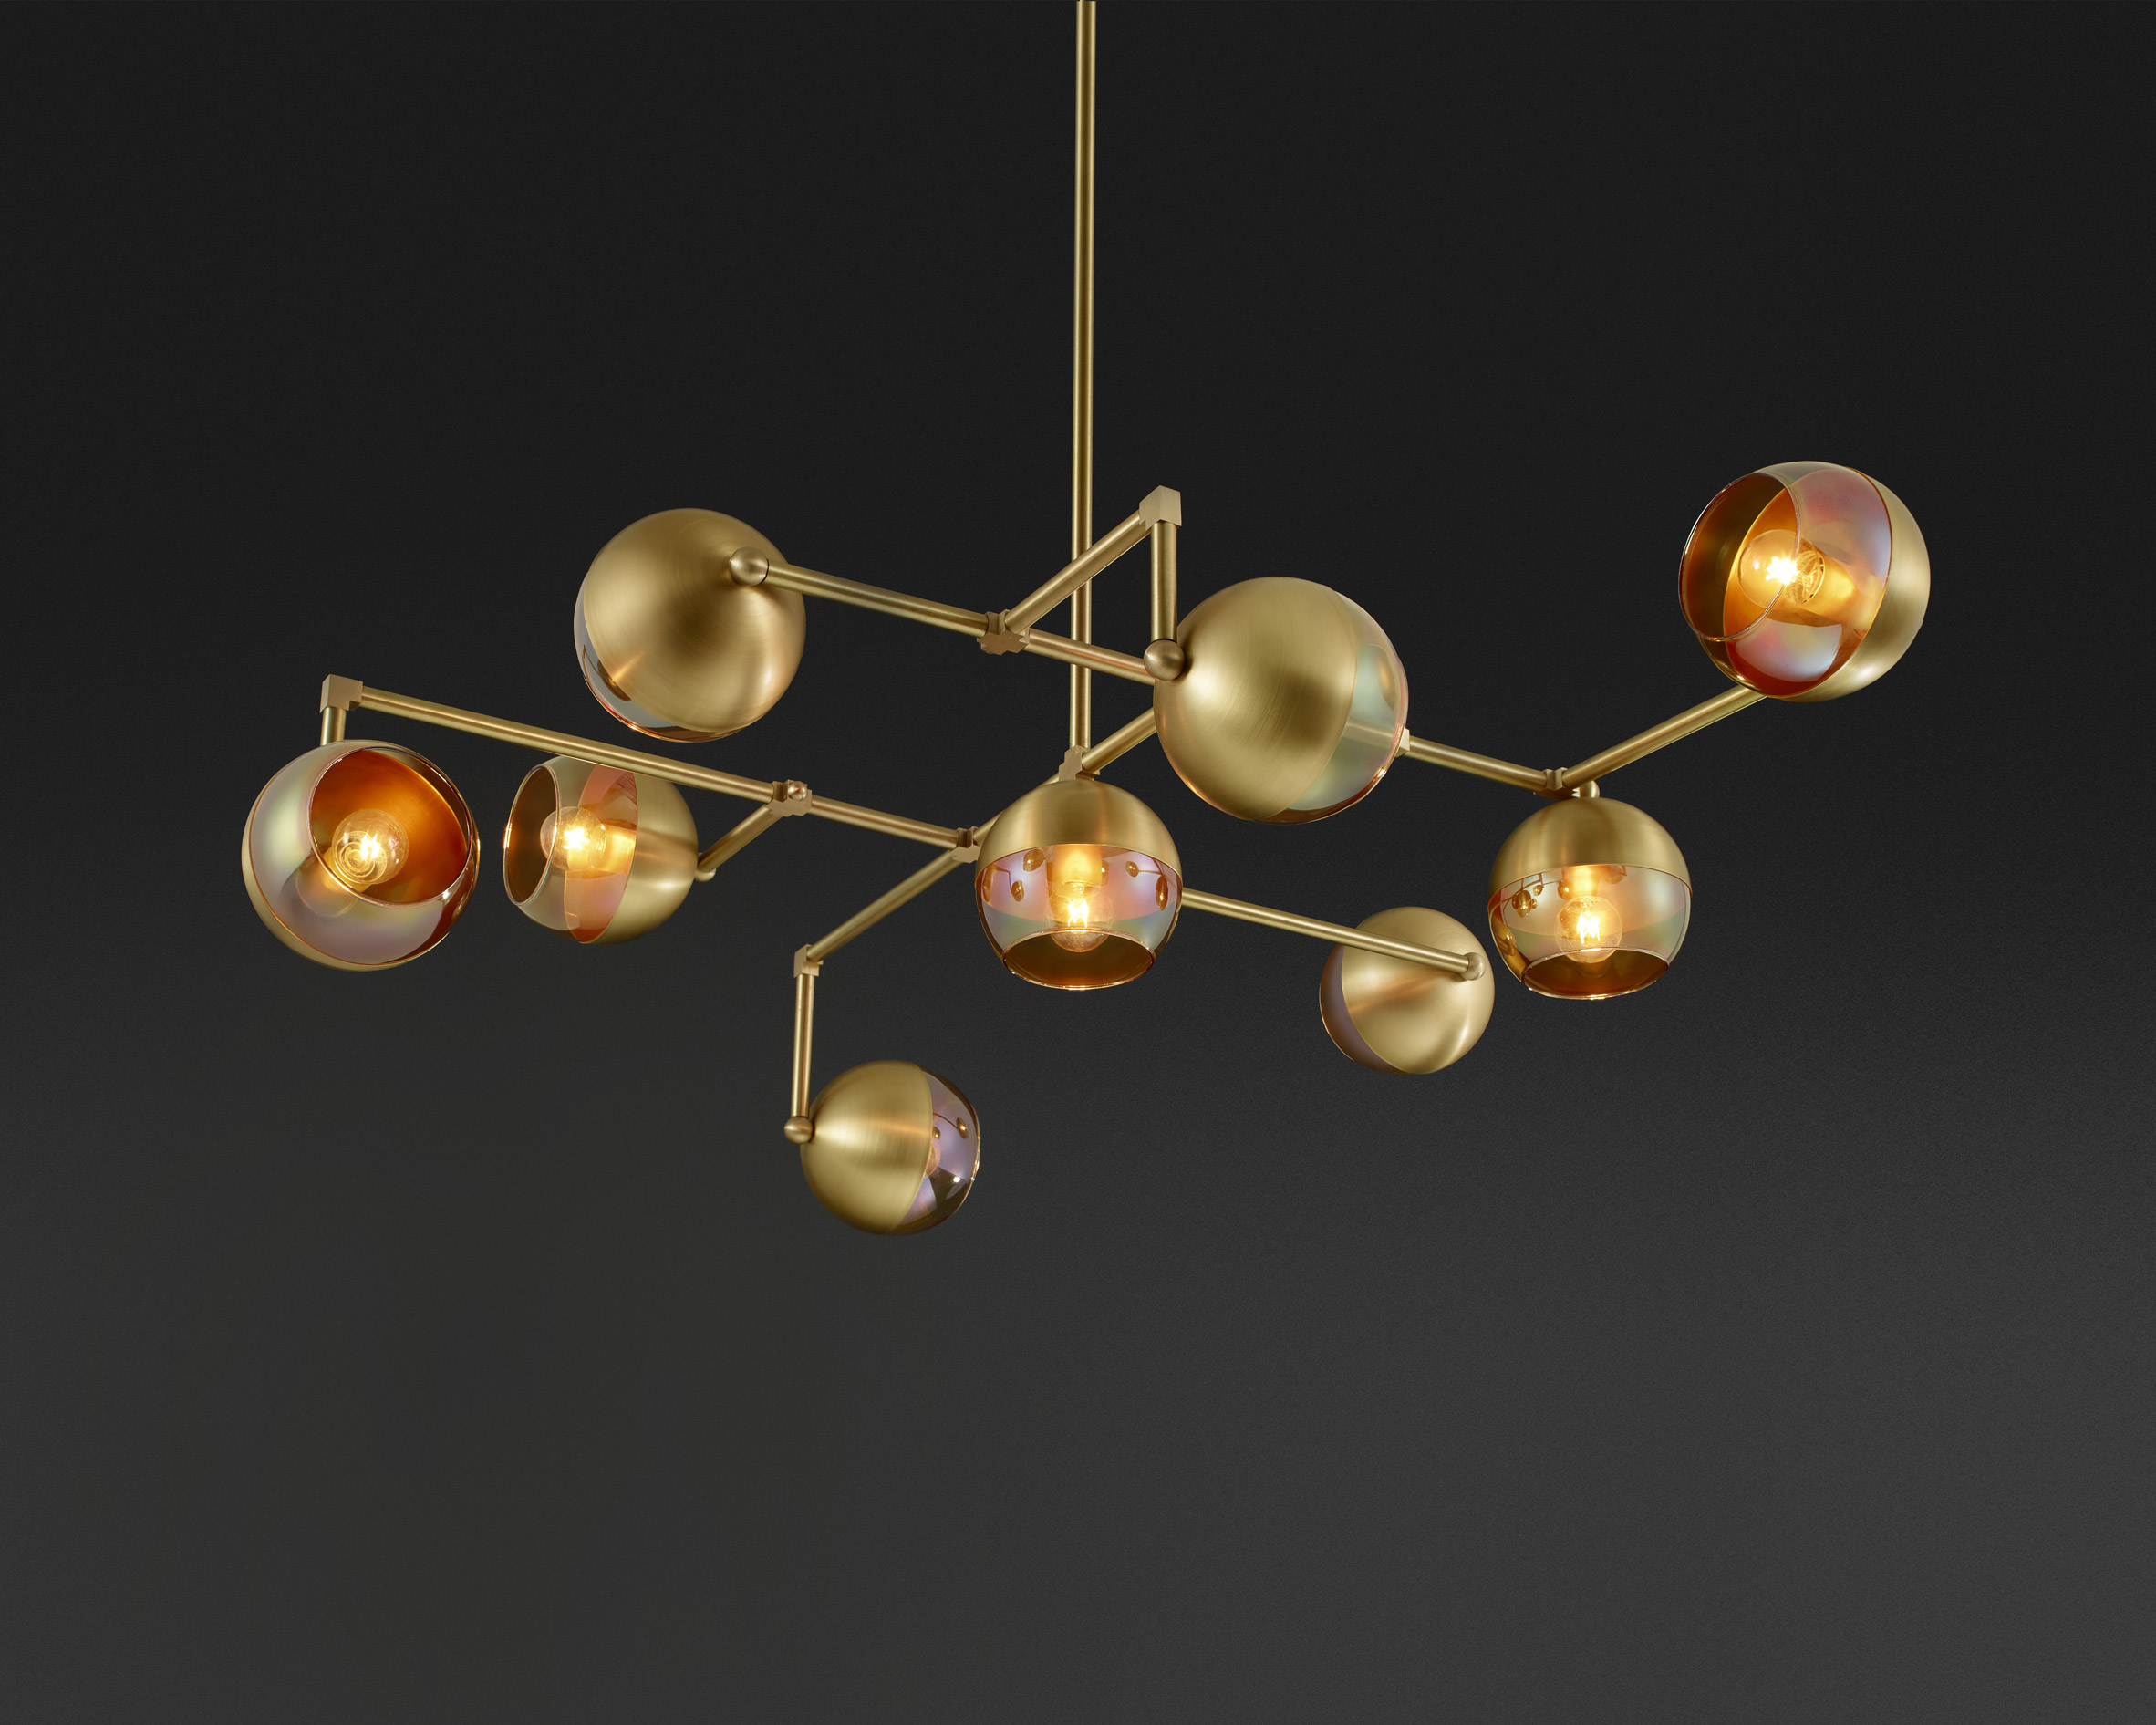 Lightmaker Studio presents geometric brass lighting at IDS Toronto